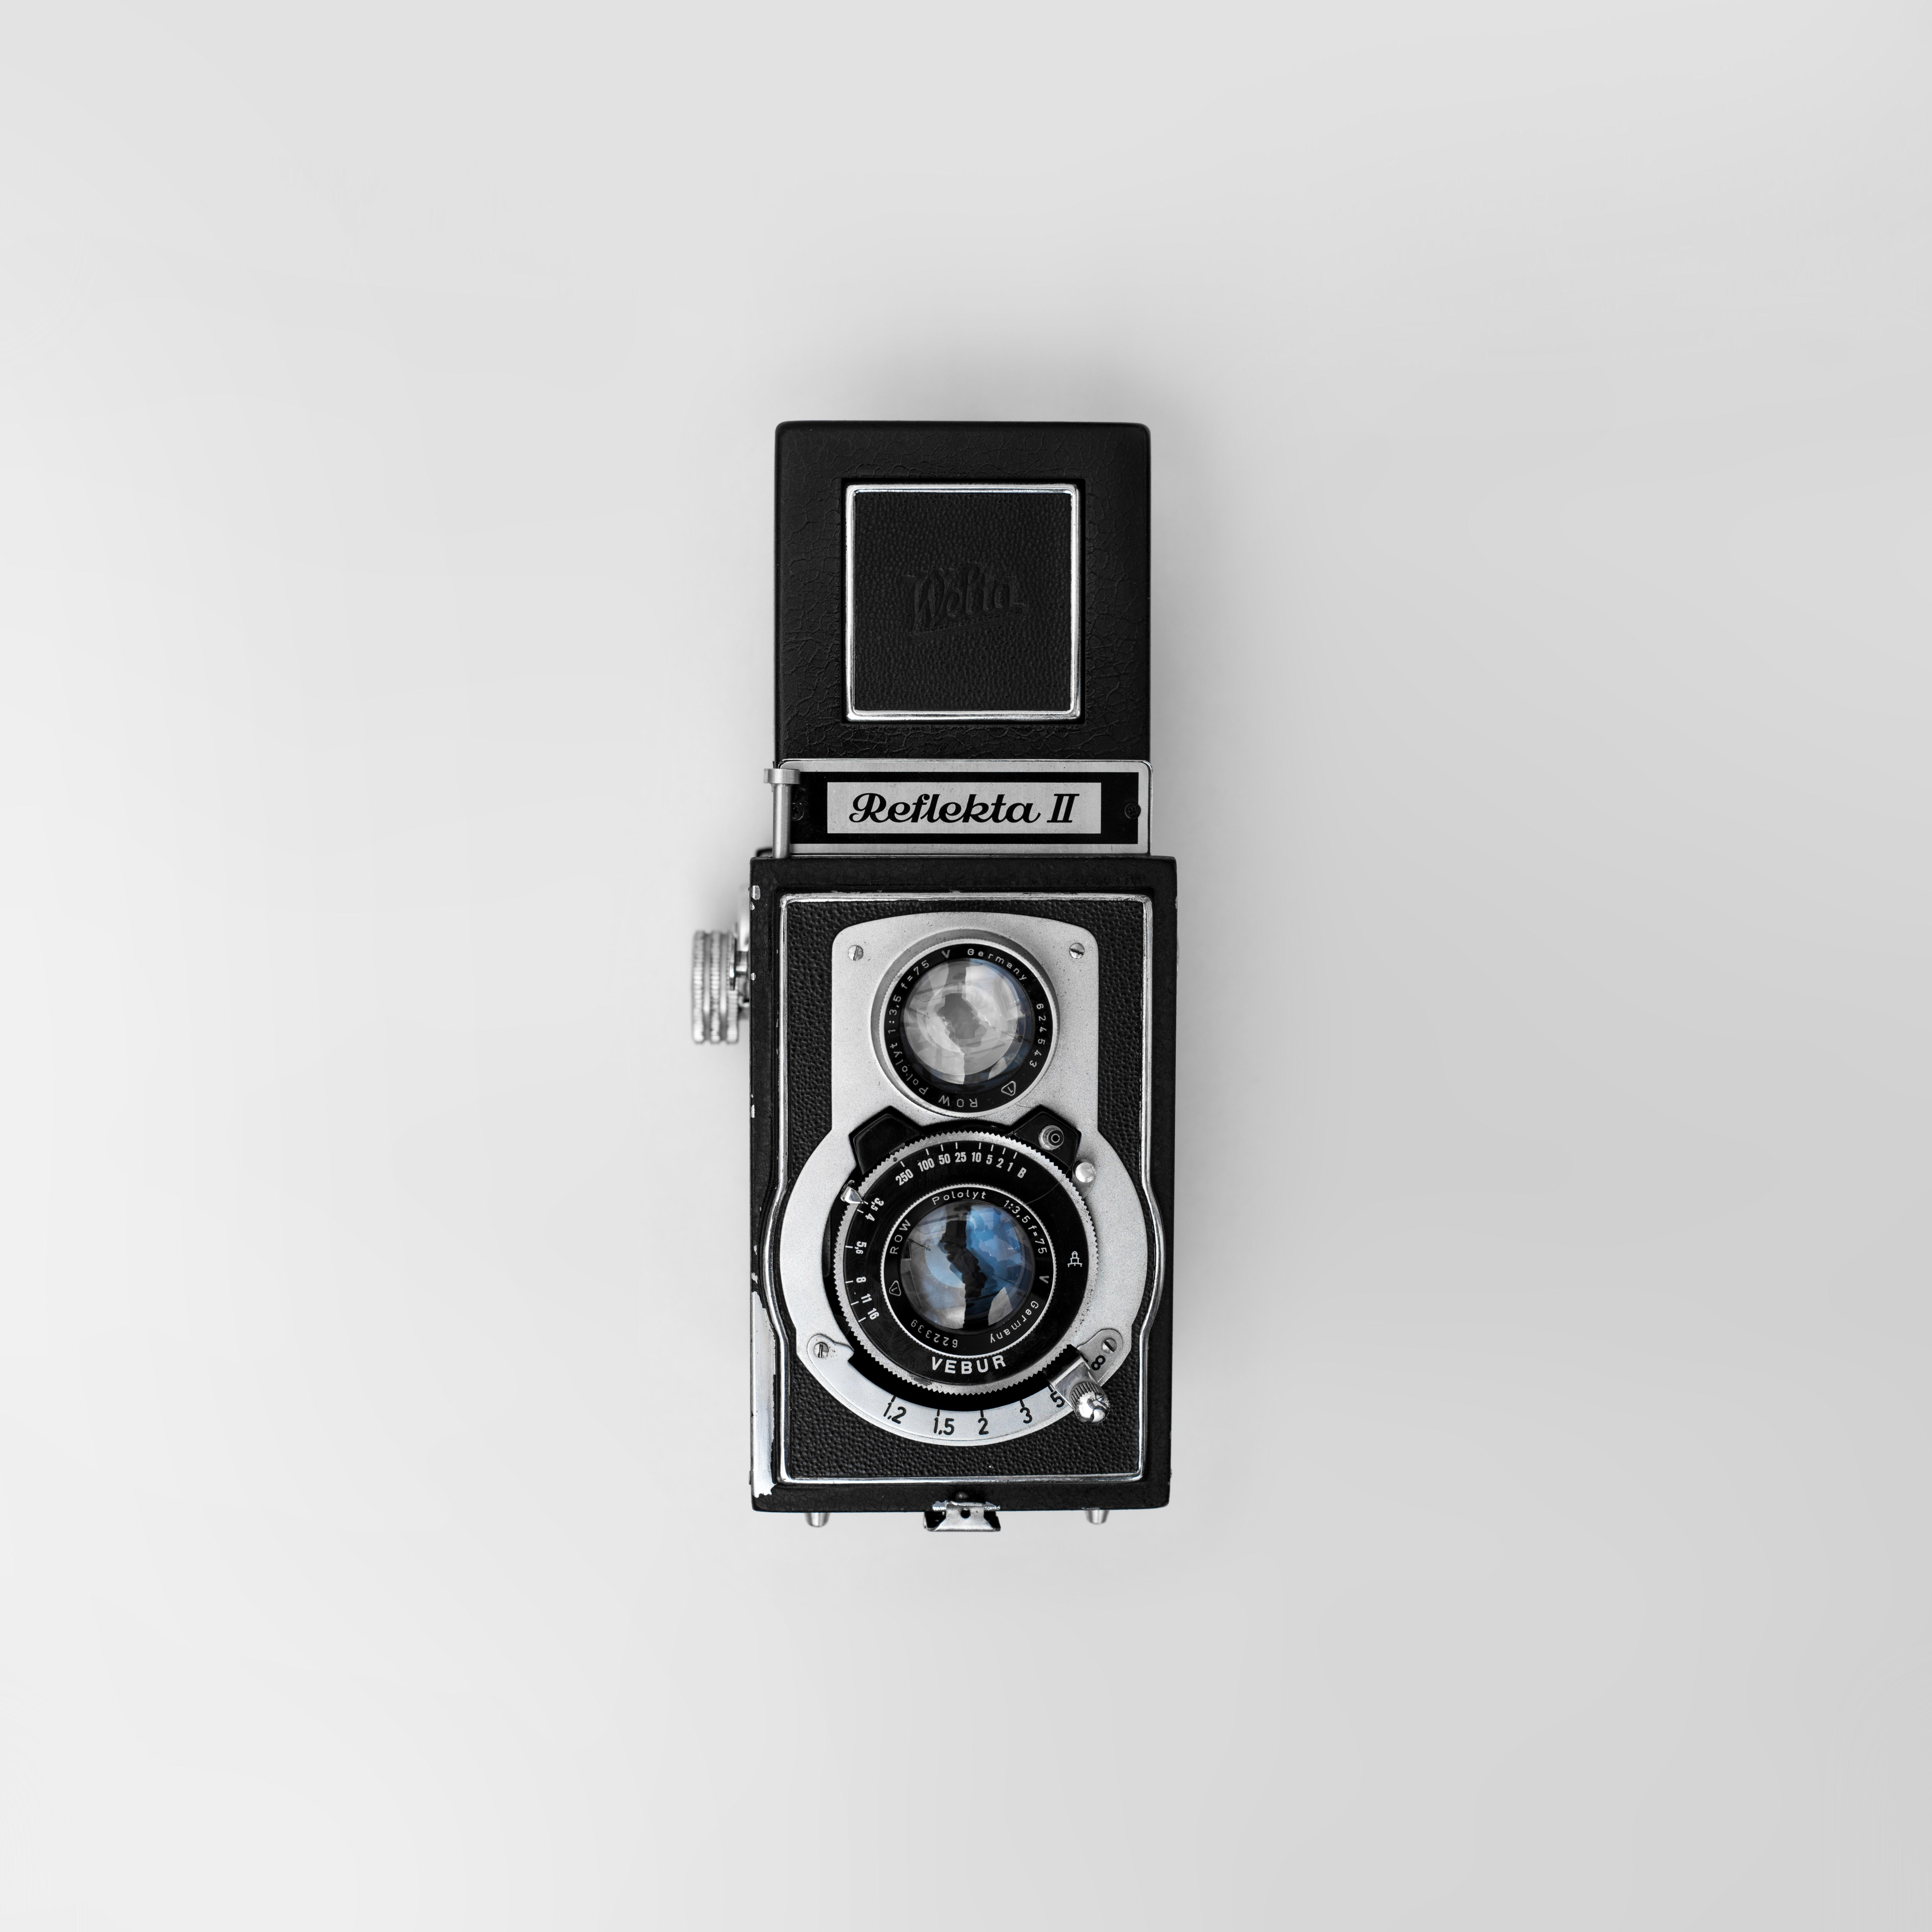 Gray and black raketa 2 trail camera photo